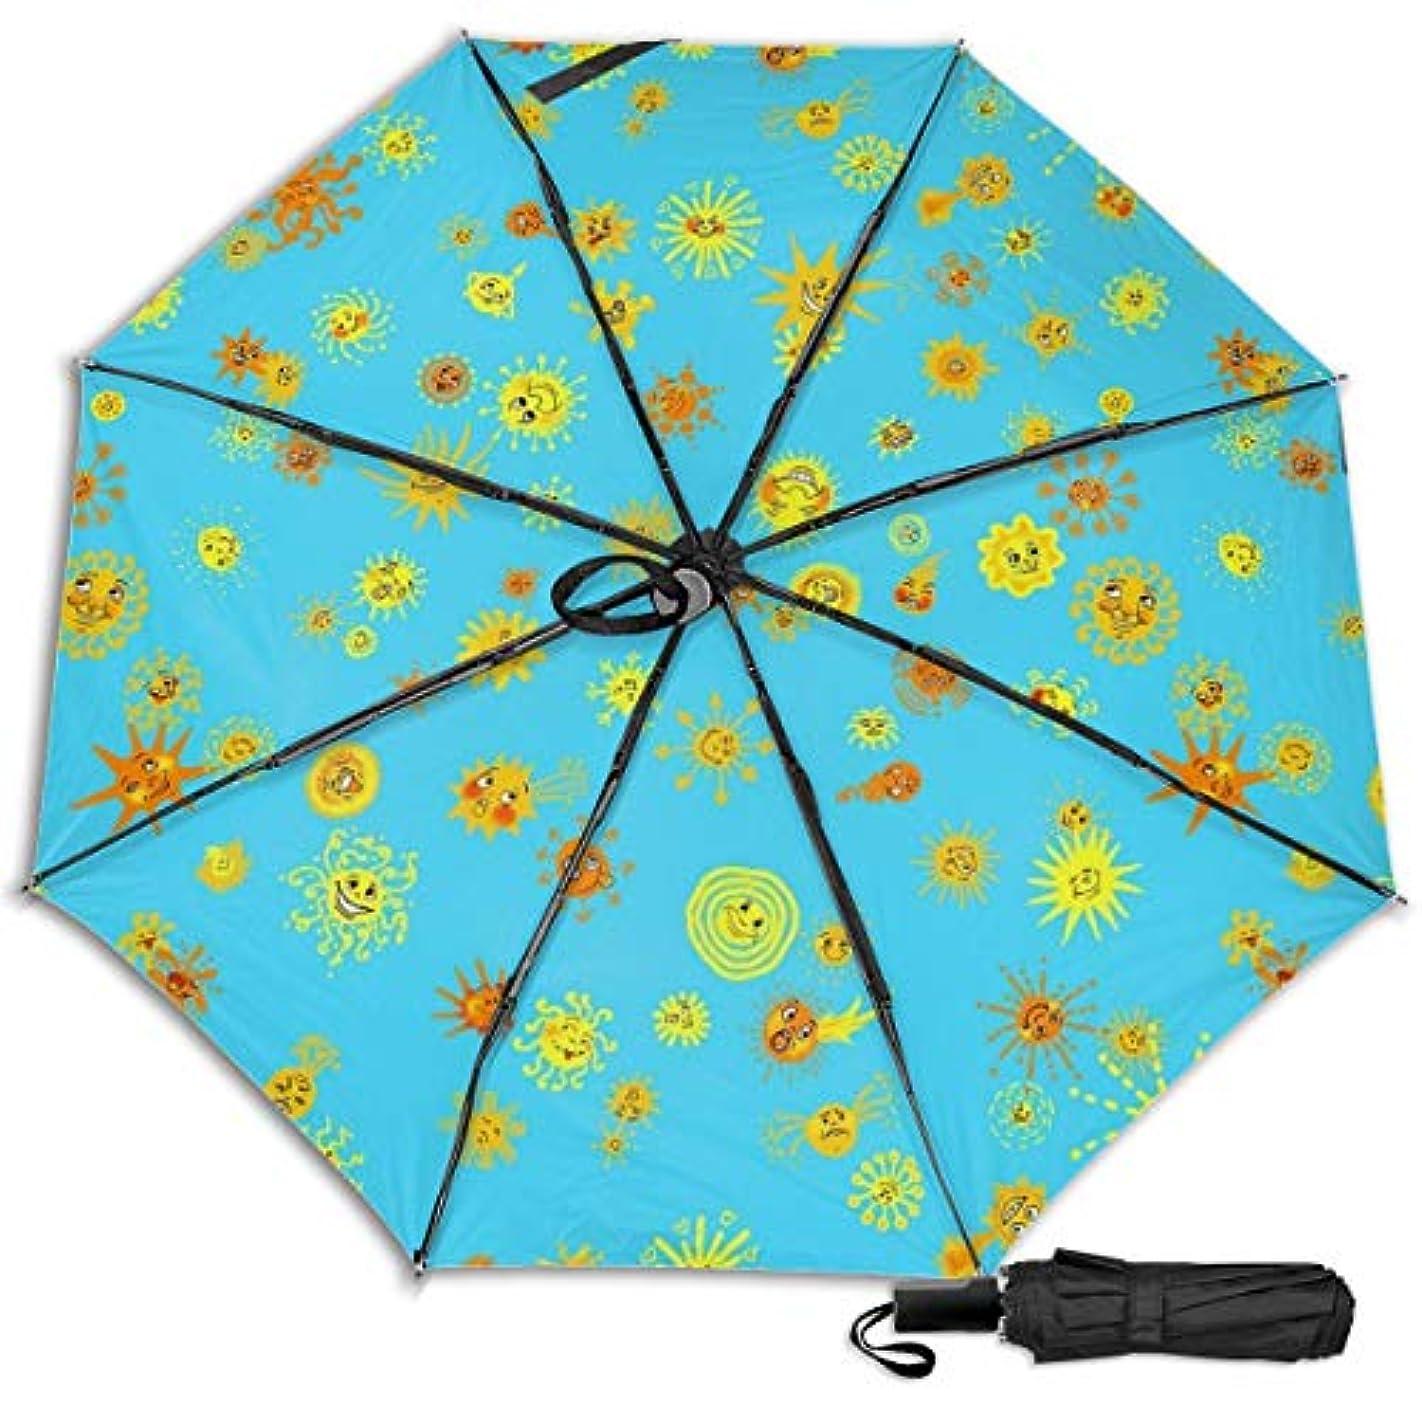 吸う概要暫定日照大会日傘 折りたたみ日傘 折り畳み日傘 超軽量 遮光率100% UVカット率99.9% UPF50+ 紫外線対策 遮熱効果 晴雨兼用 携帯便利 耐風撥水 手動 男女兼用